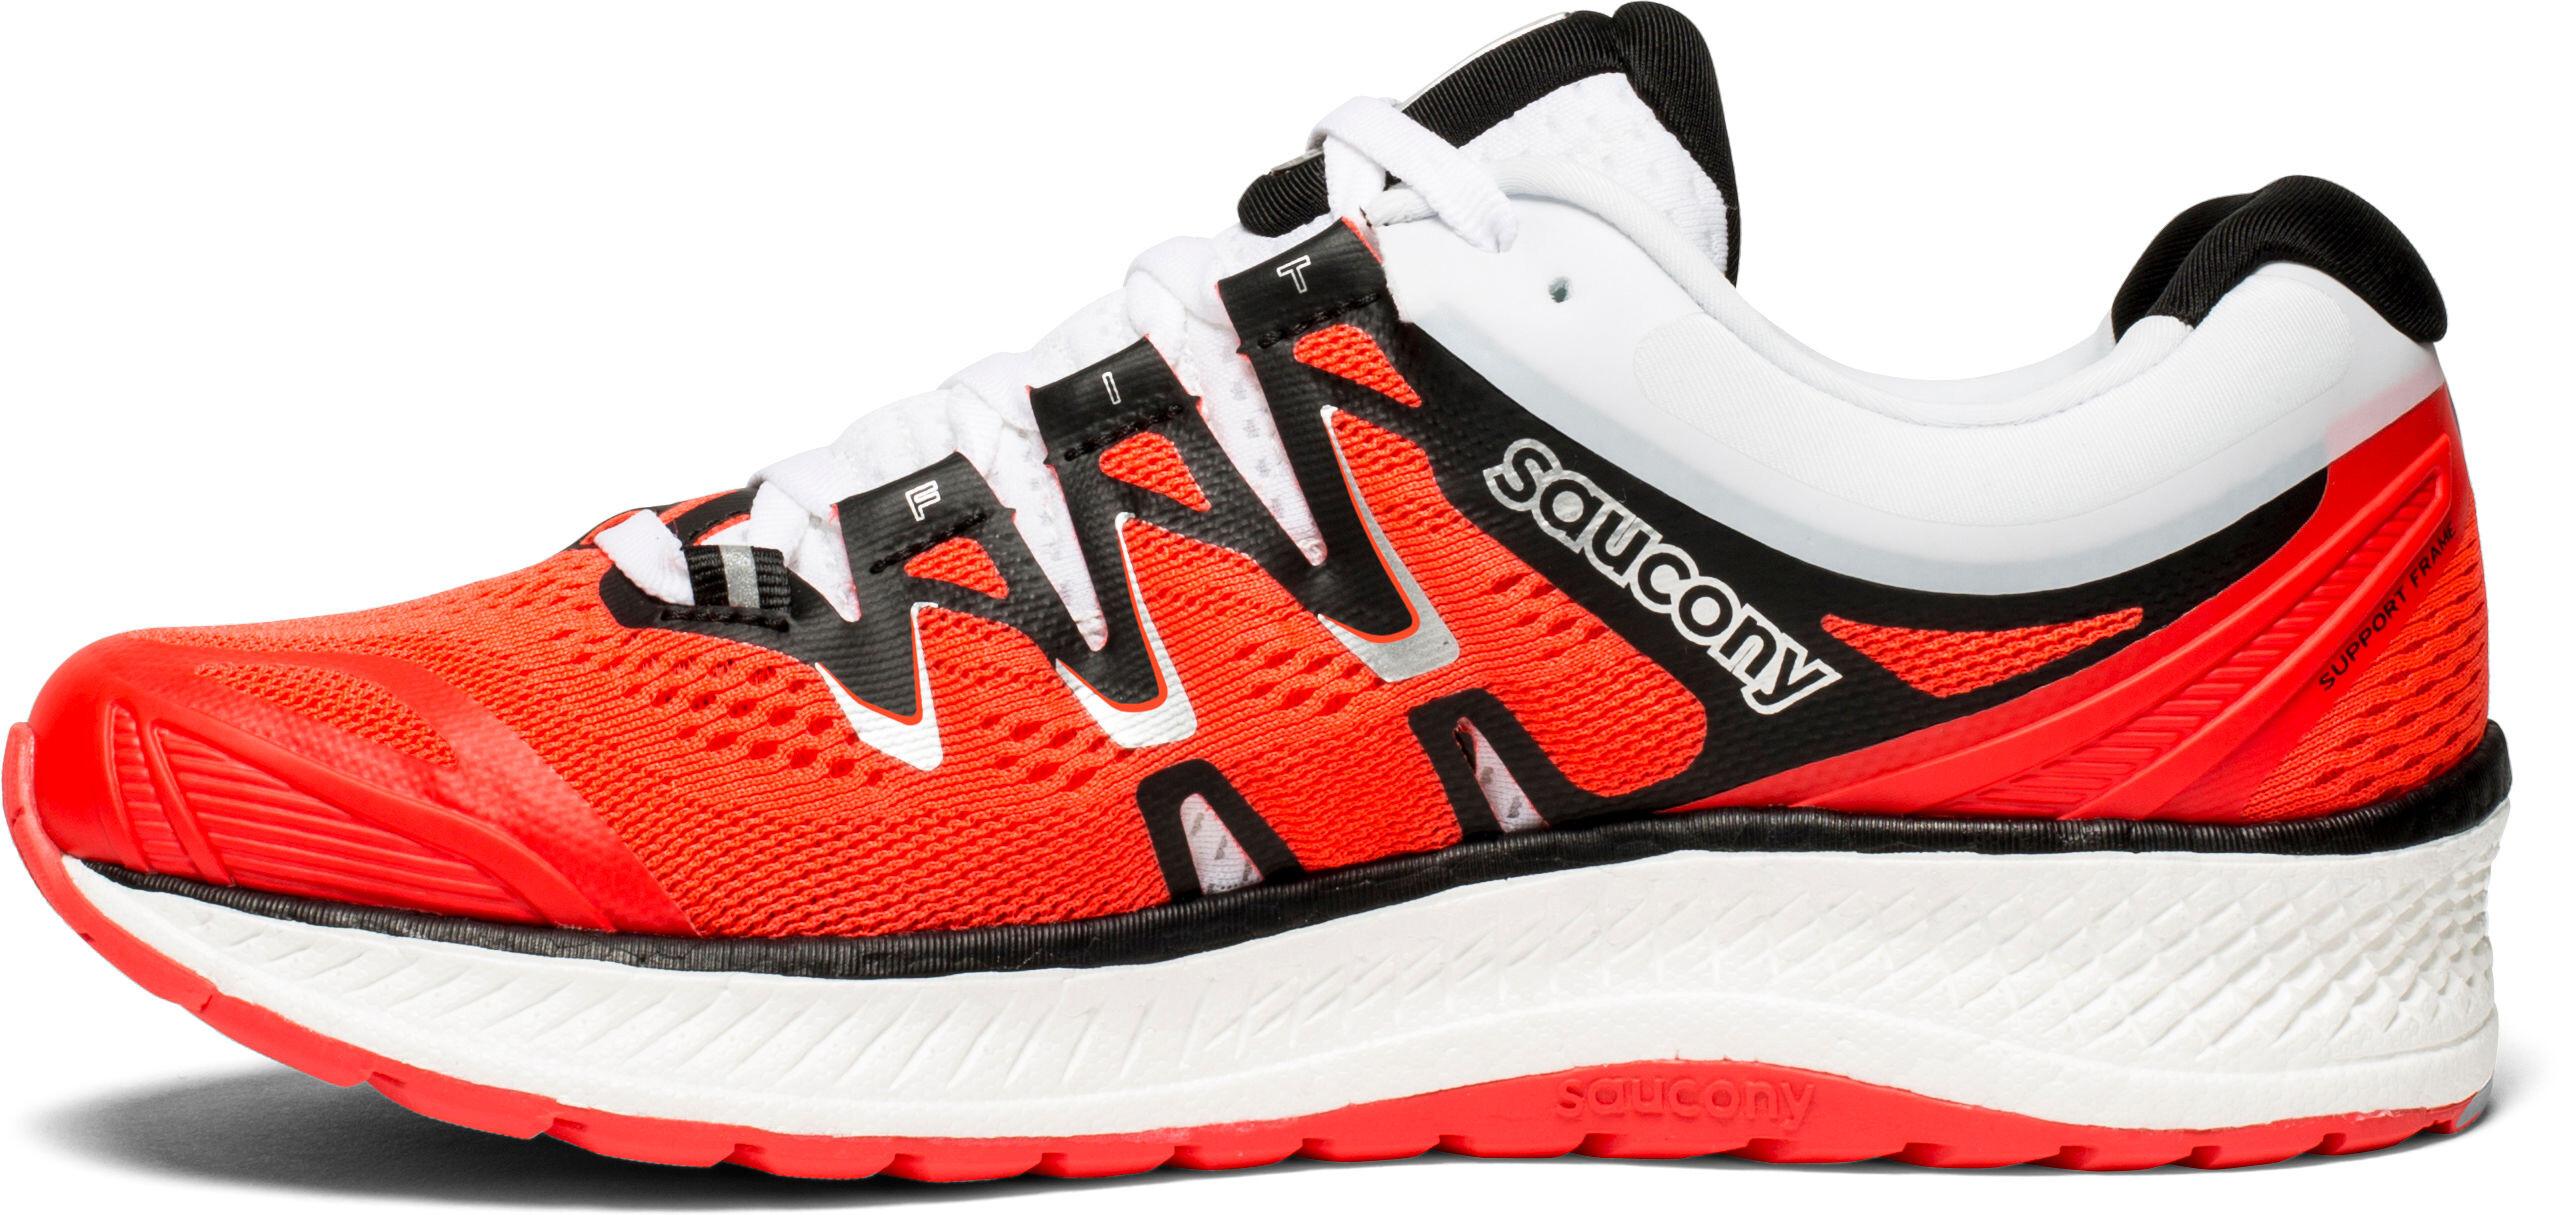 7c08743e188 saucony Triumph ISO 4 - Chaussures running Femme - rouge noir ...